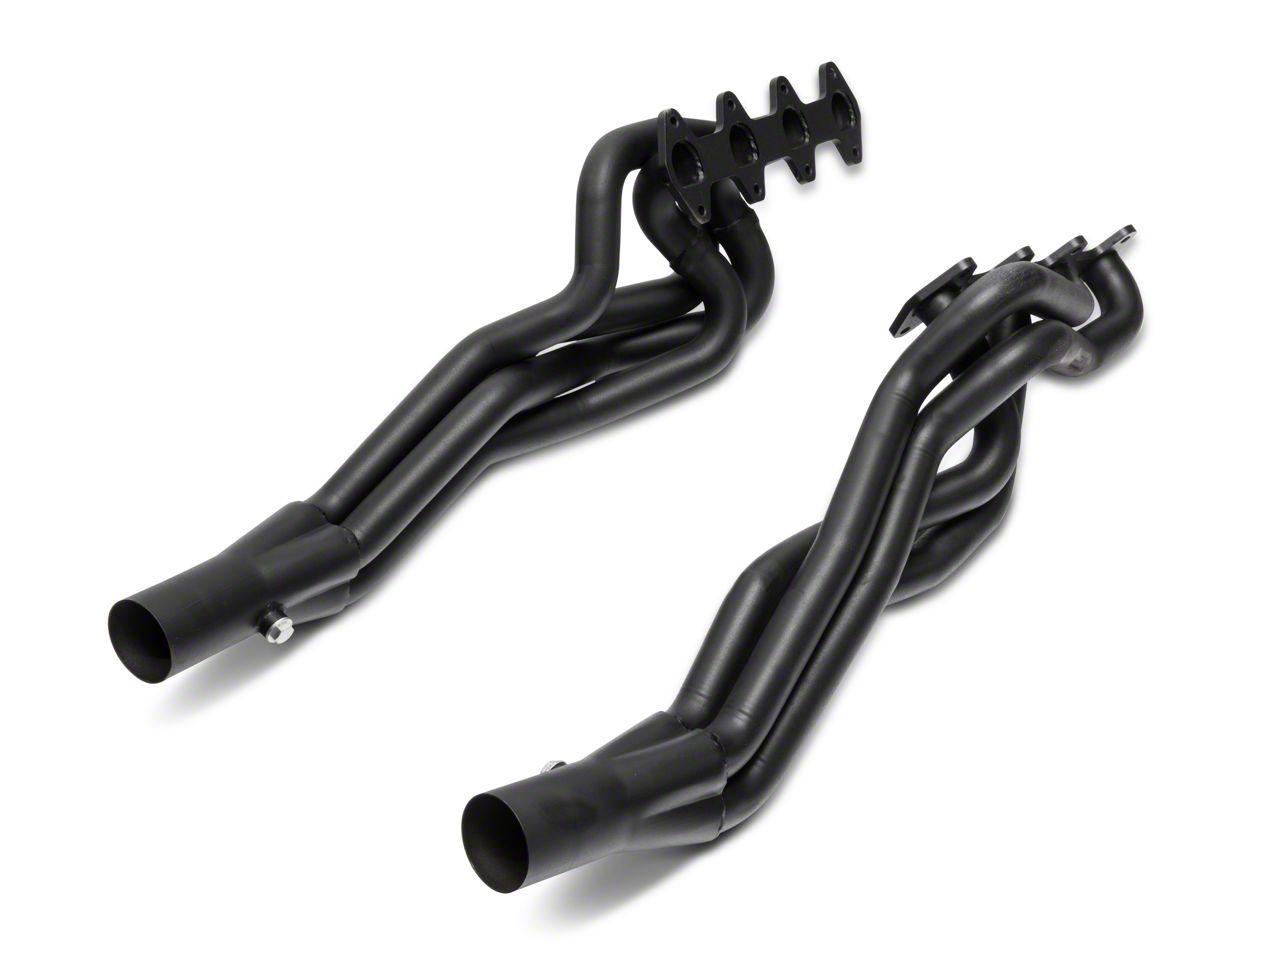 SR Performance 1-3/4 in. Black Long Tube Headers (05-10 GT)